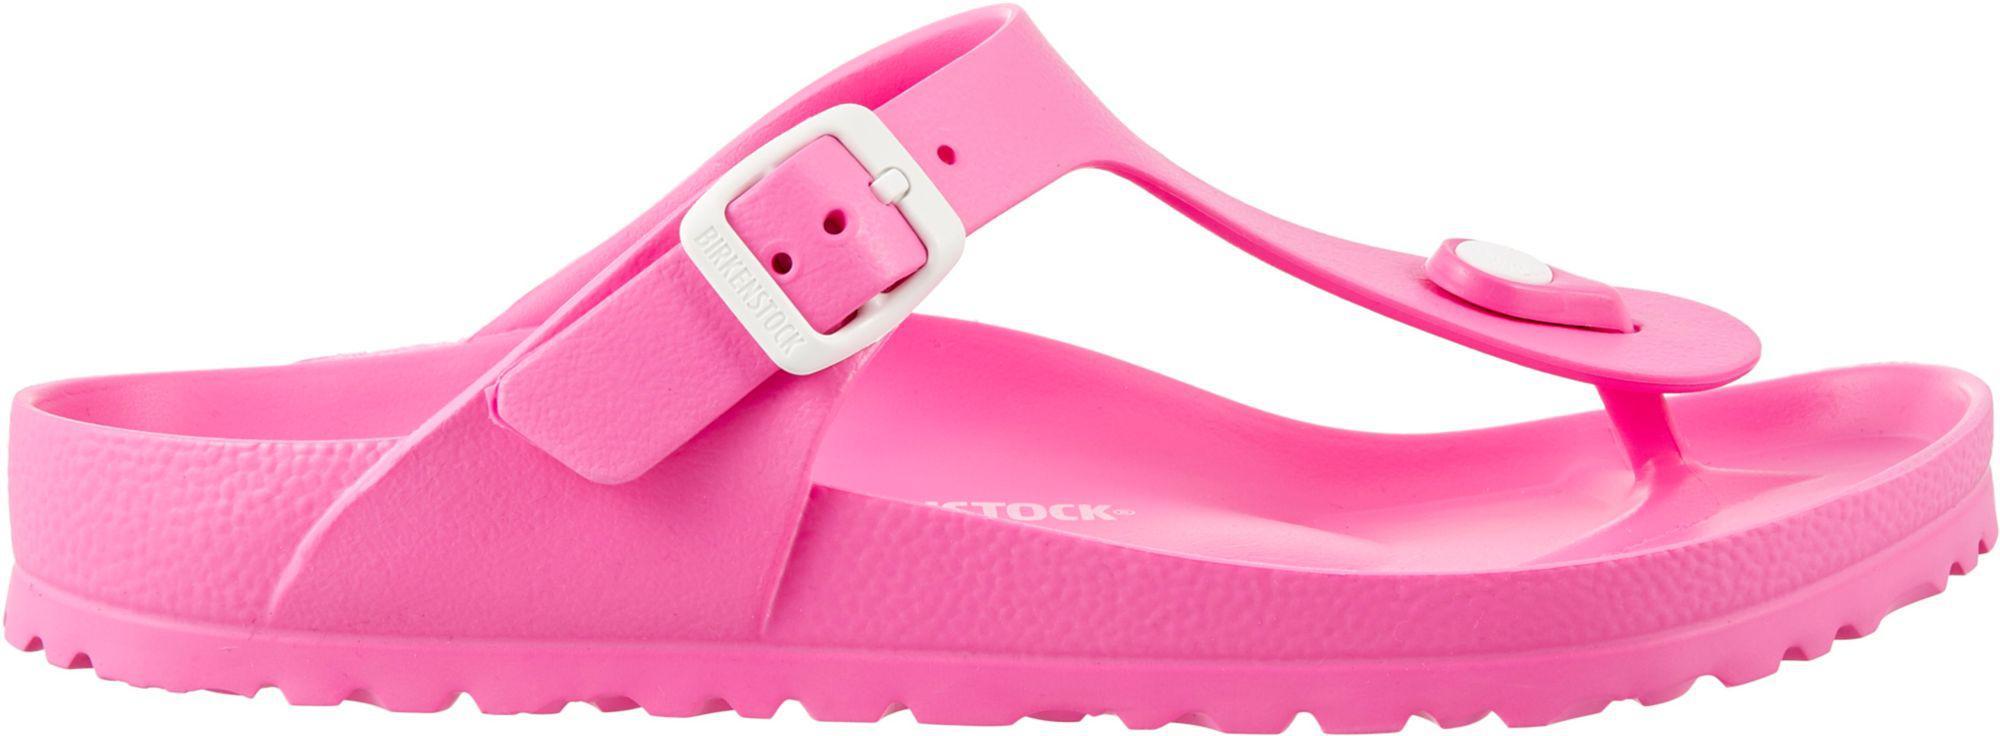 b1c6cfd6d7d9d2 Lyst - Birkenstock Gizeh Essentials Eva Sandals in Pink